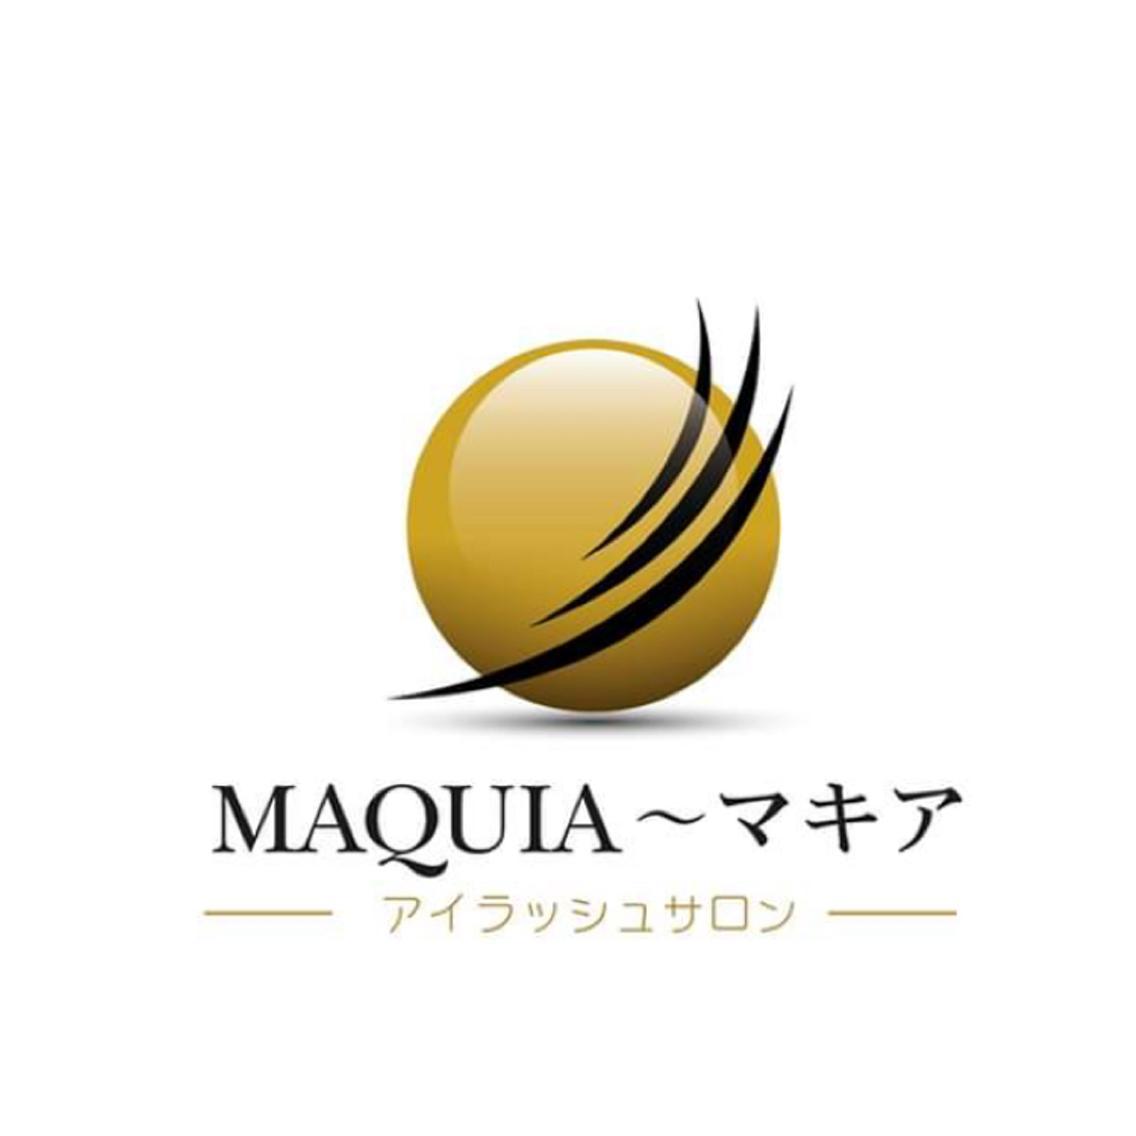 MAQUIA(マキア)川越店所属・MAQUIA川越店 大和田の掲載